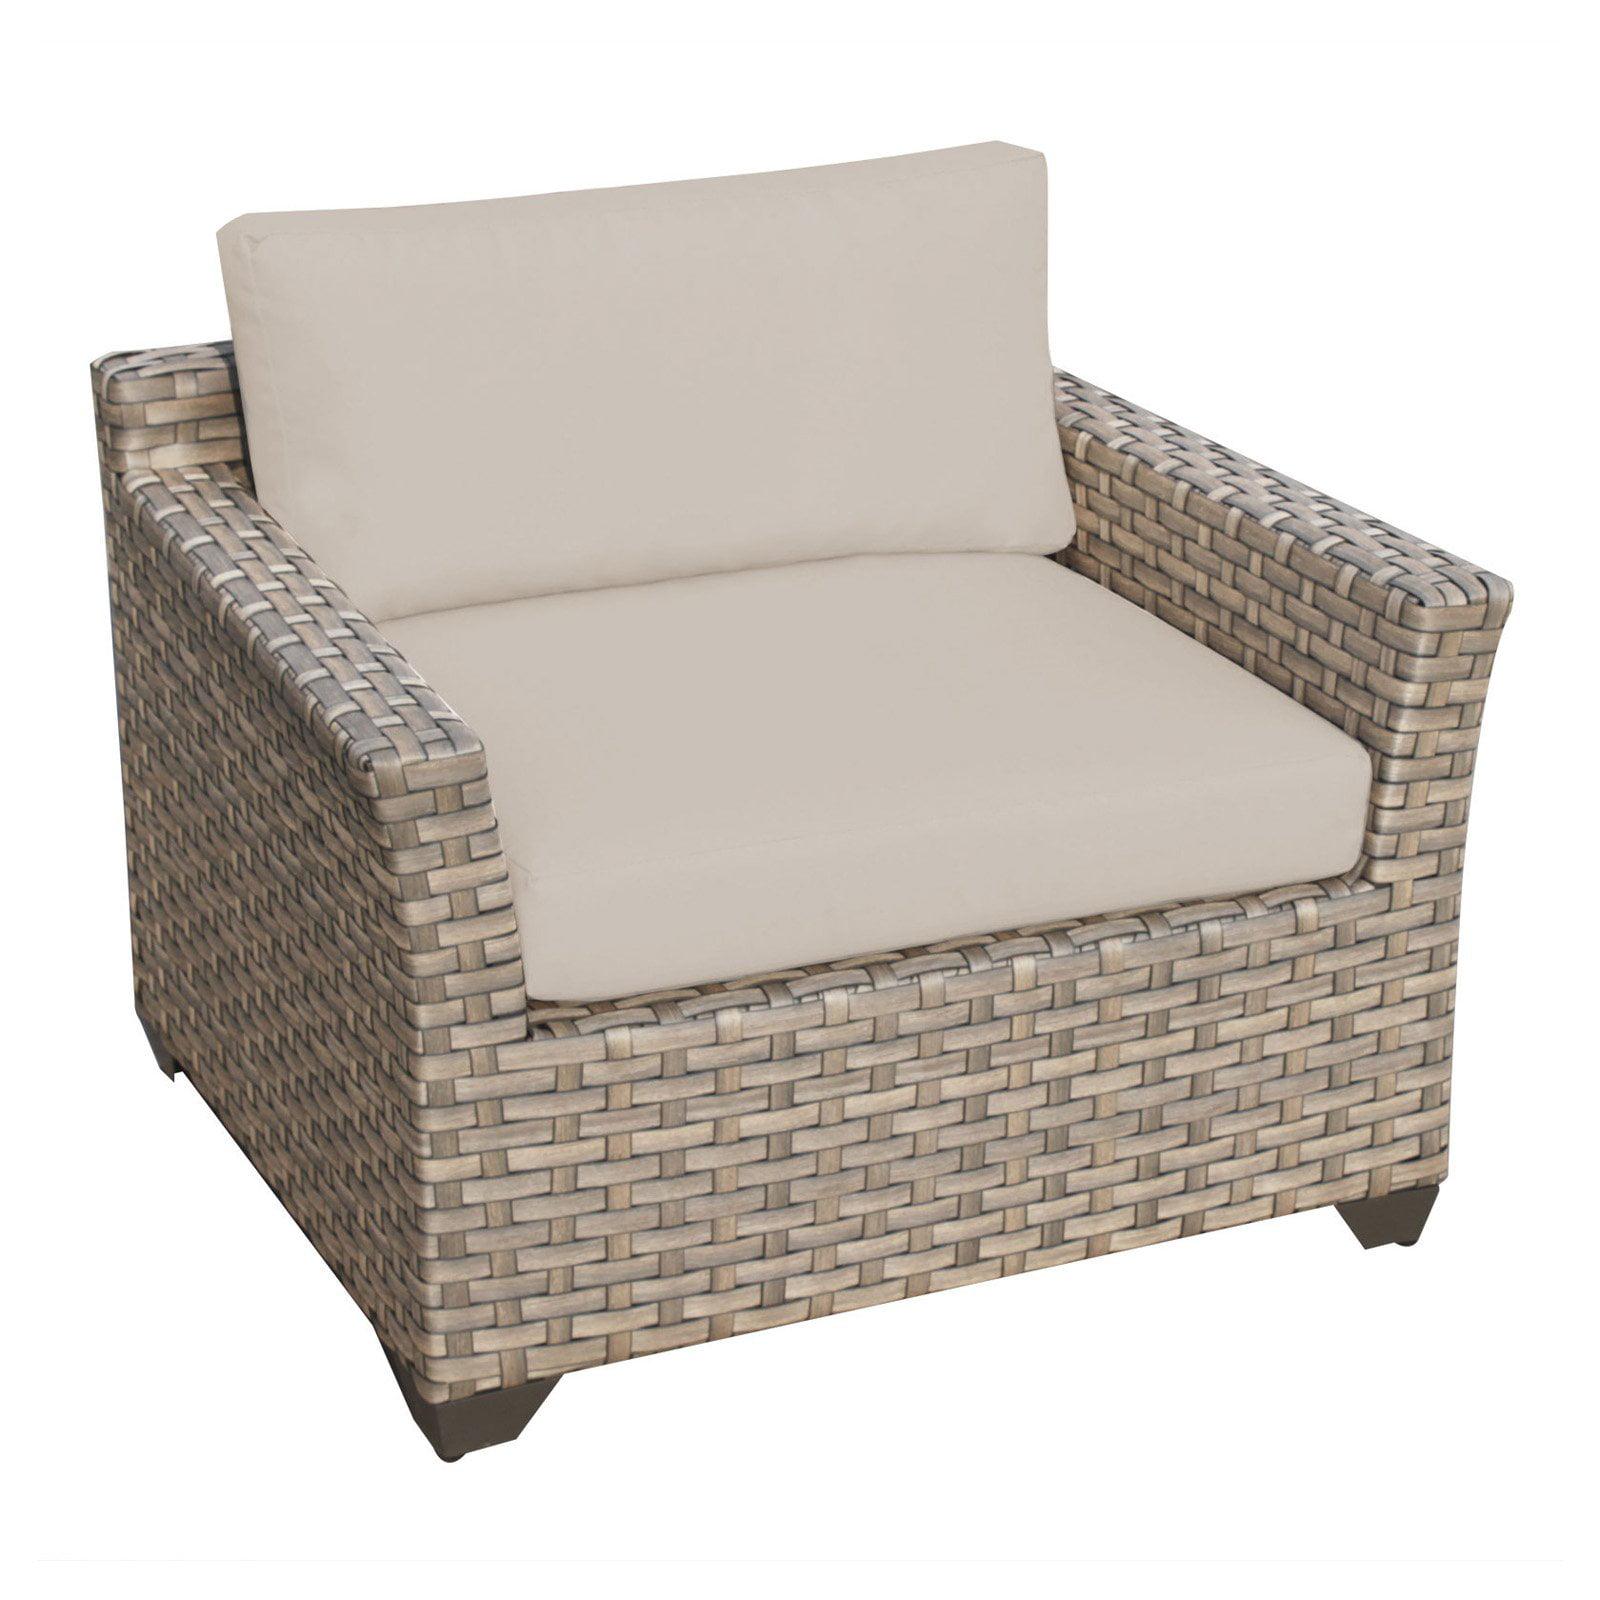 TK Classics Barbados Wicker Outdoor Club Chair